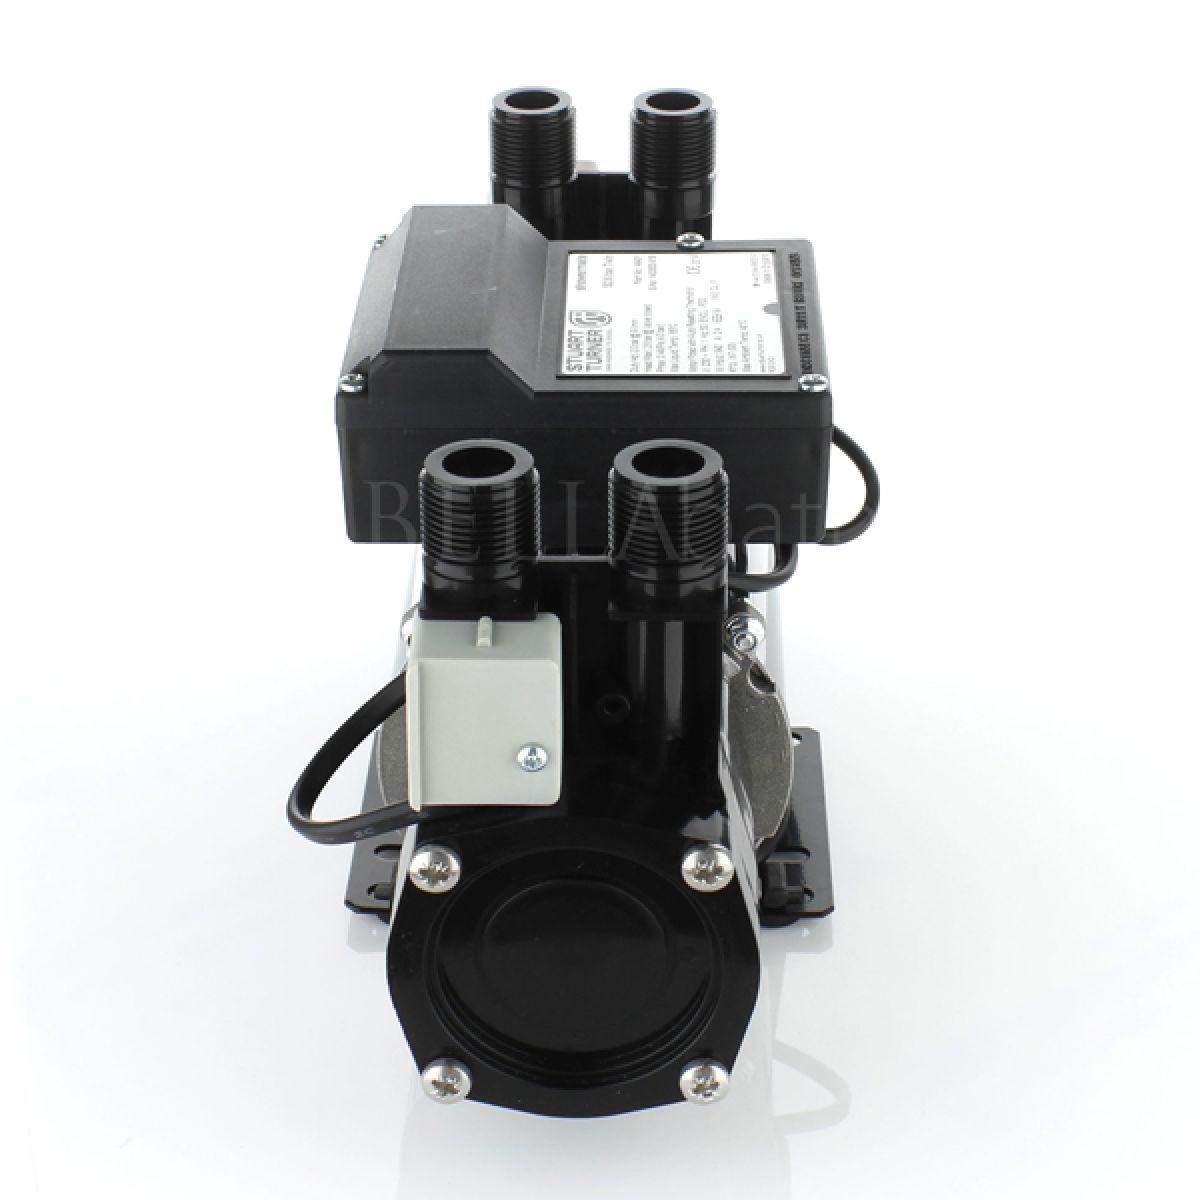 Stuart Turner 46431 Showermate Standard Twin 2.6 Bar Pump Left